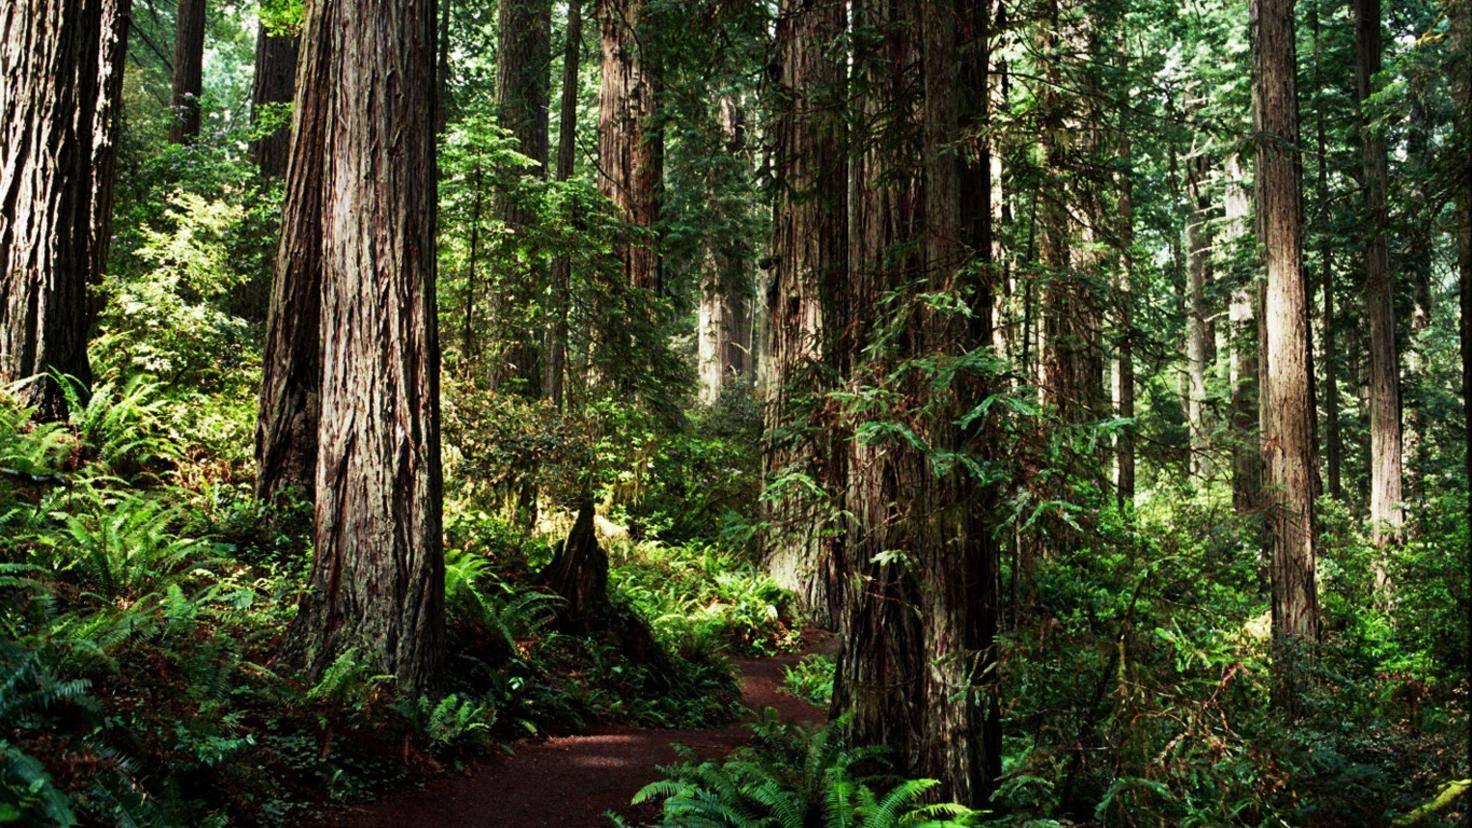 Endor Redwood National and State Parks